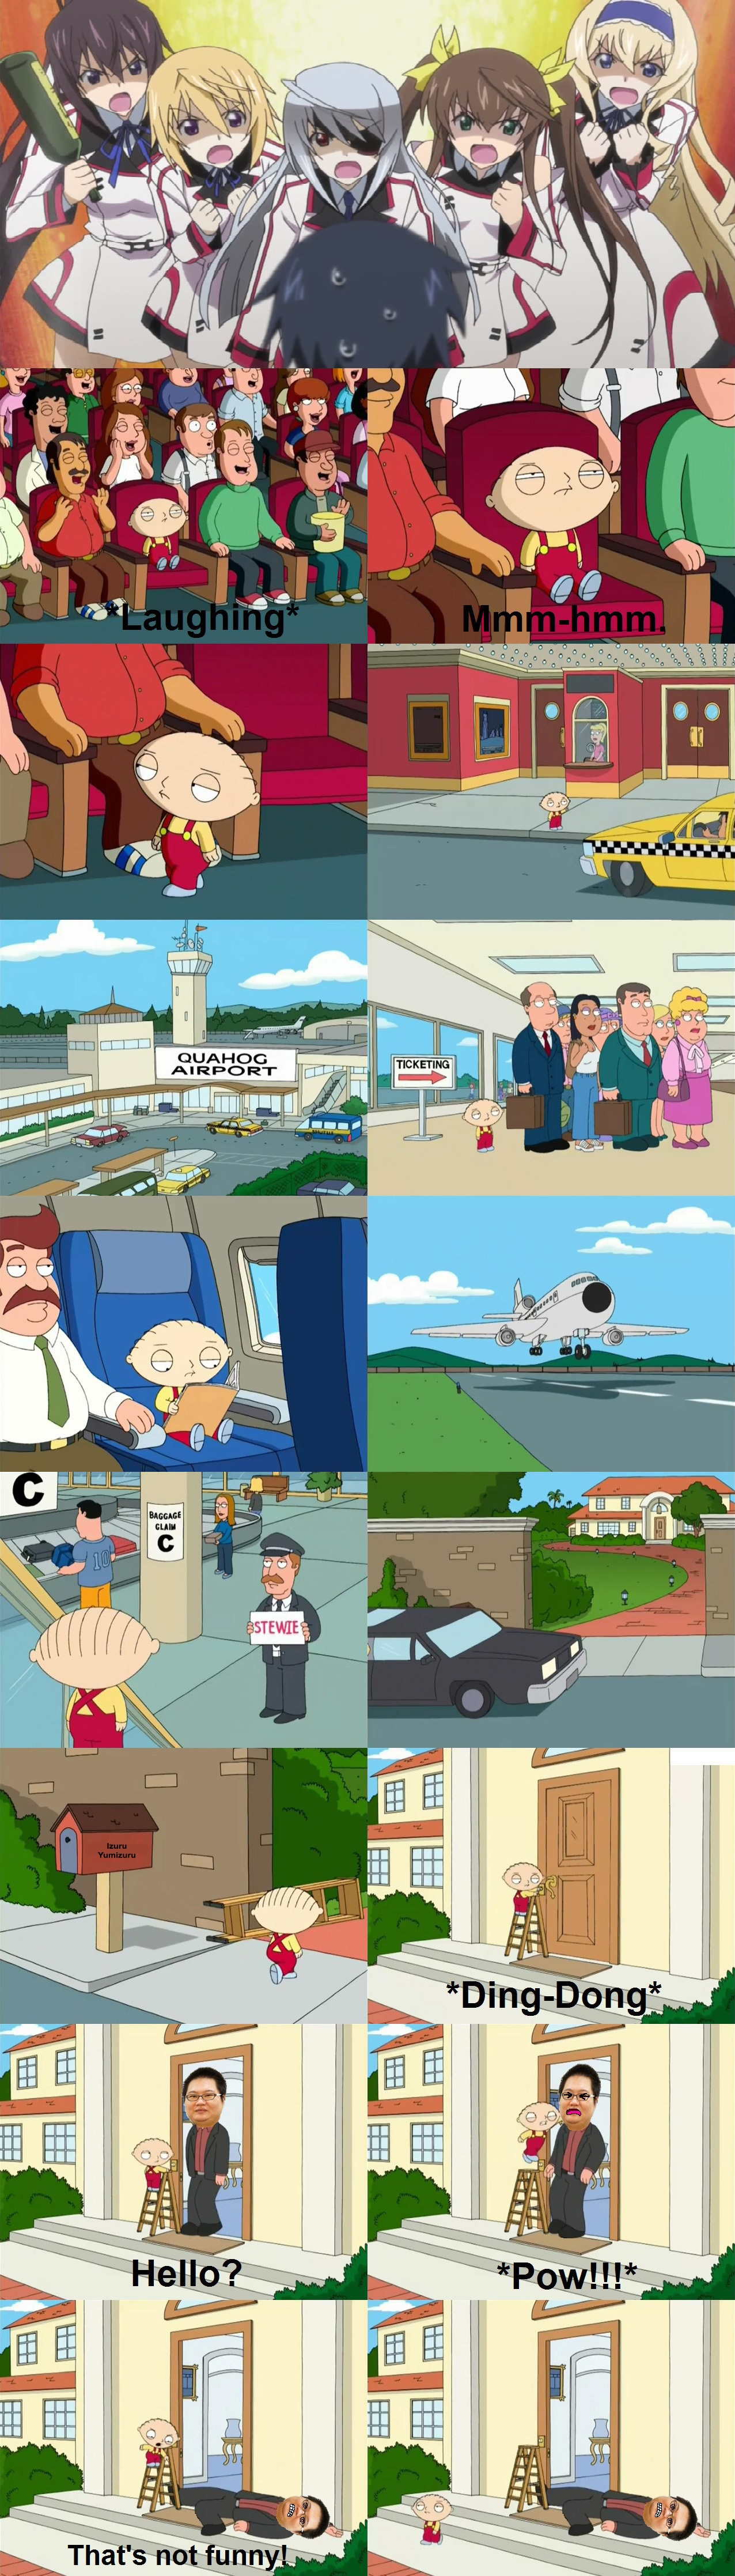 Stewie's Problem with Infinite Stratos